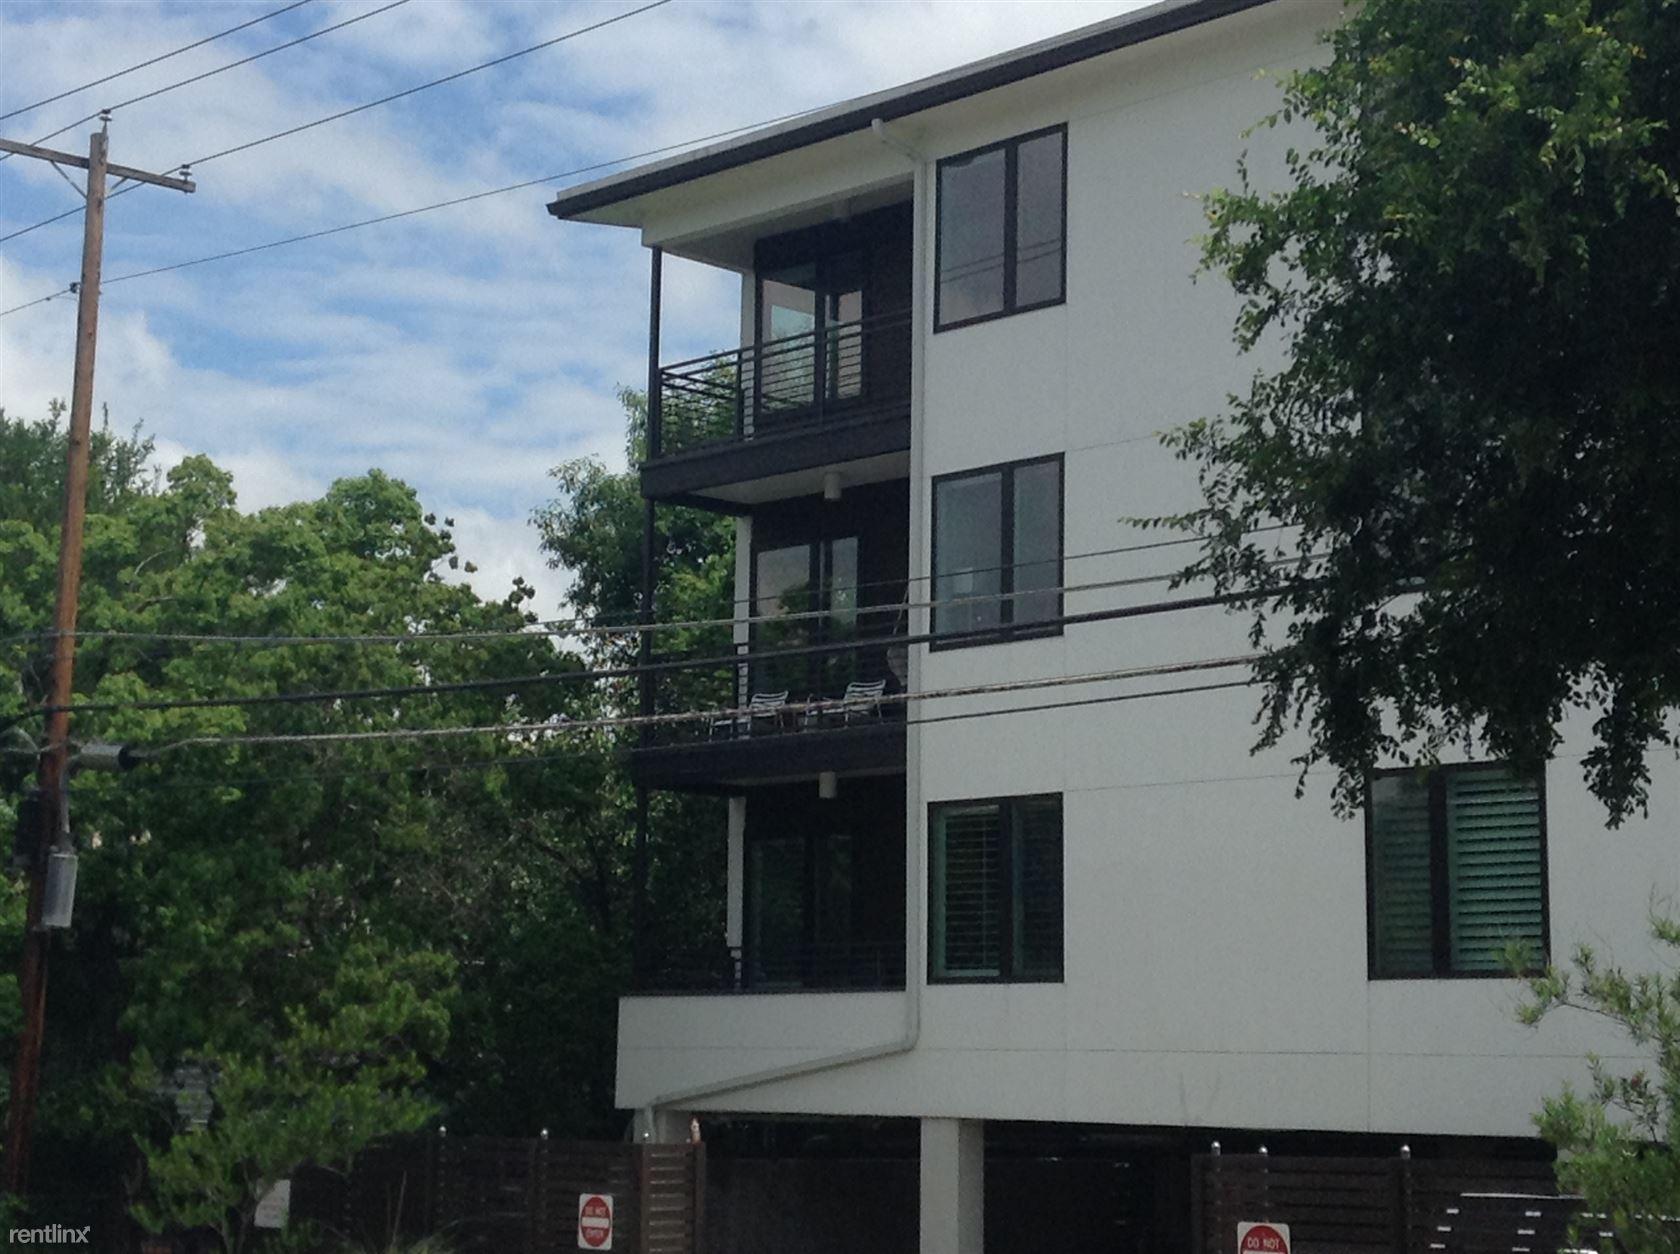 Similar Apartment at 2612 W 12th St